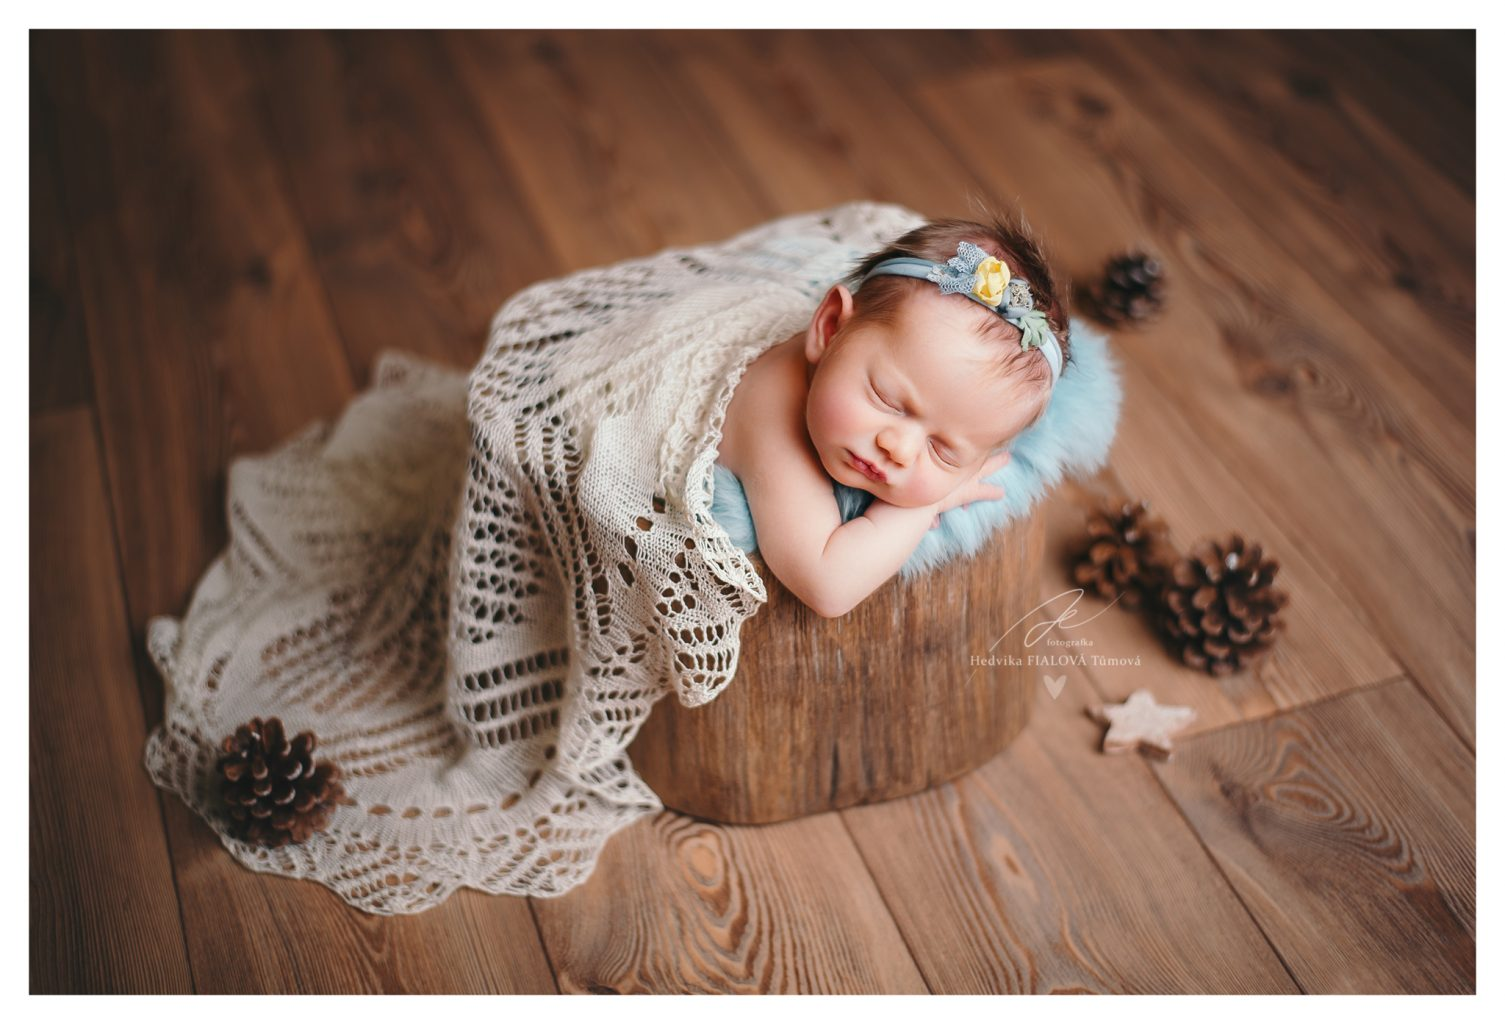 miminko v pařízku s krajkou